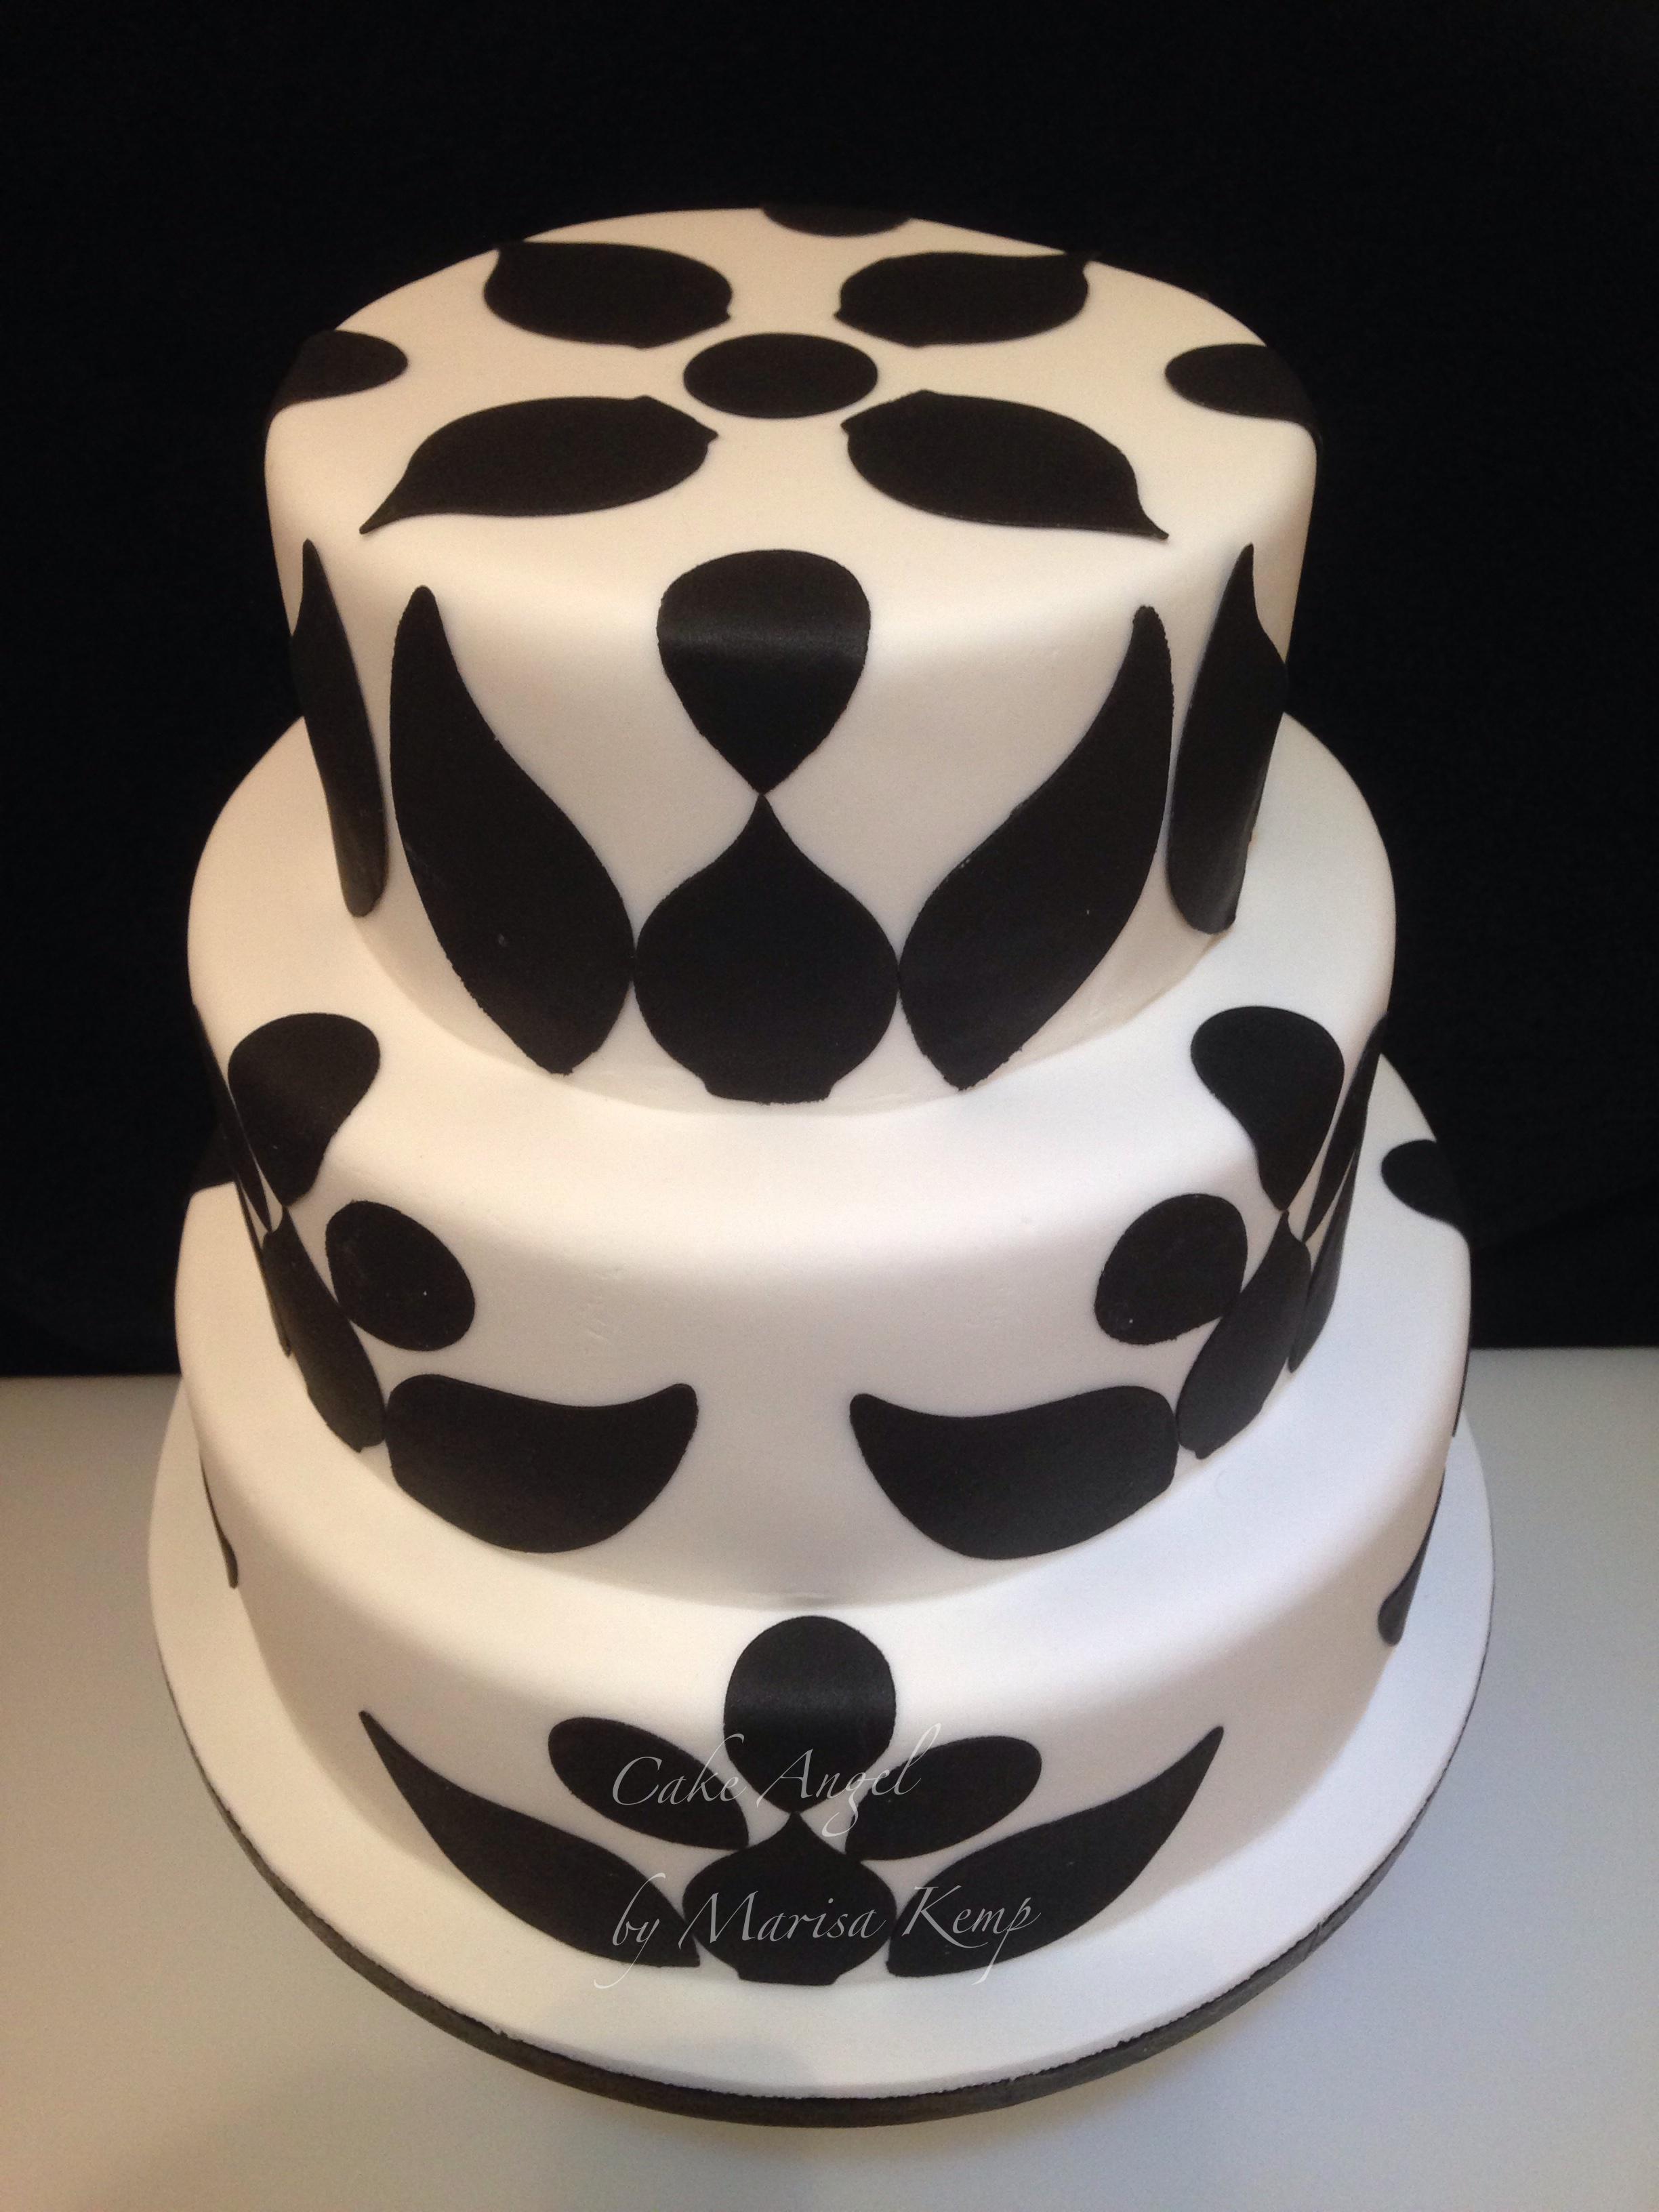 Silhouette celebration cake